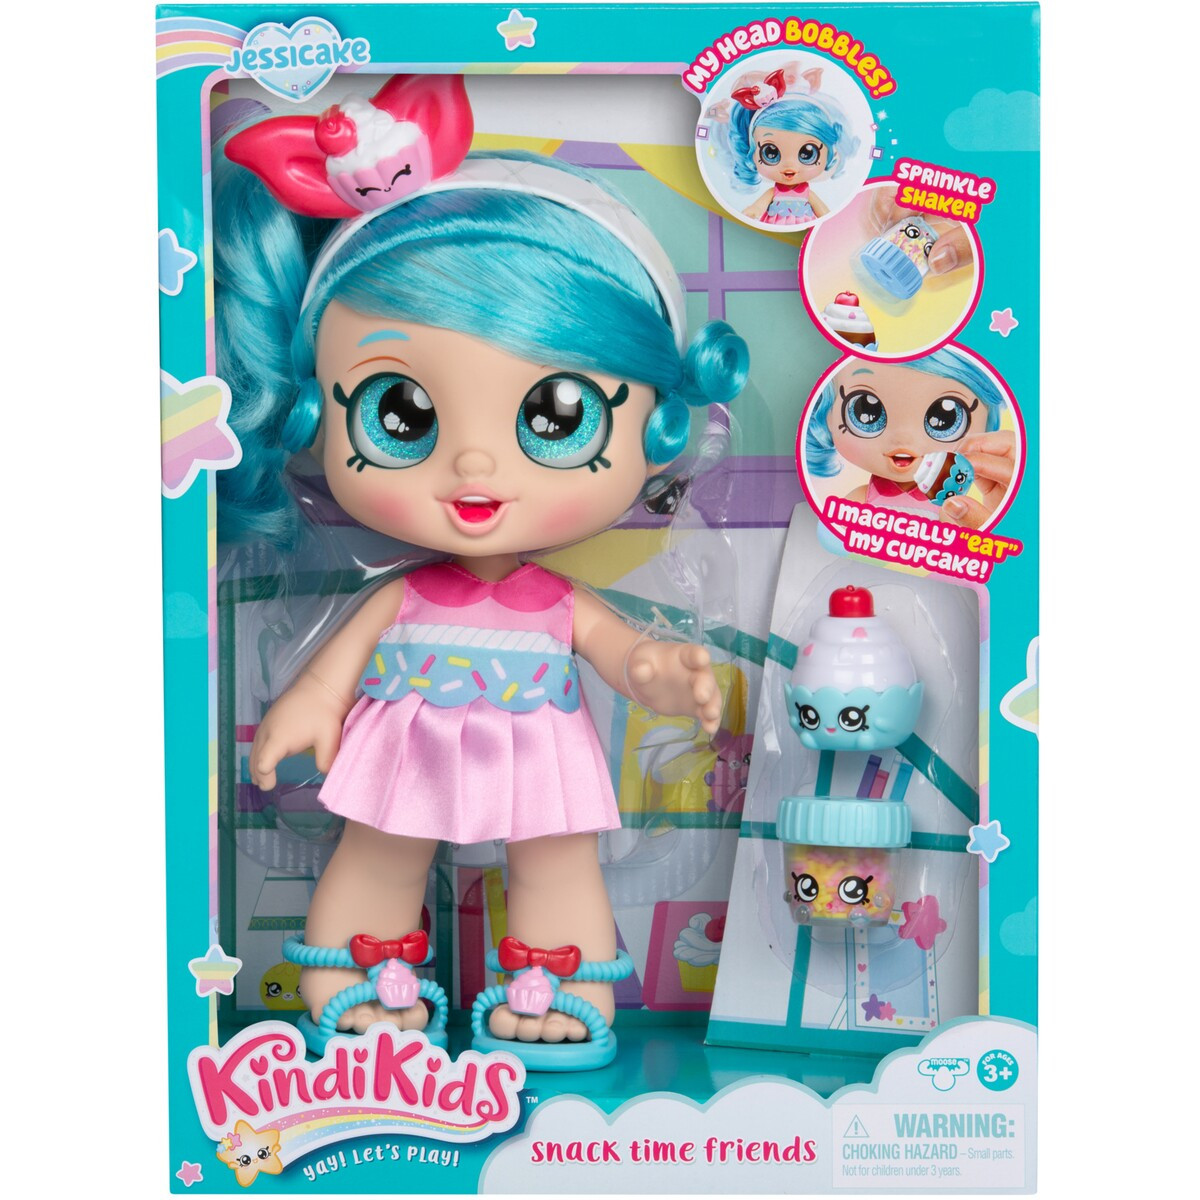 Кинди Кидс 38393 Кукла Джессикейк 25см. с акс. ТМ Kindi Kids